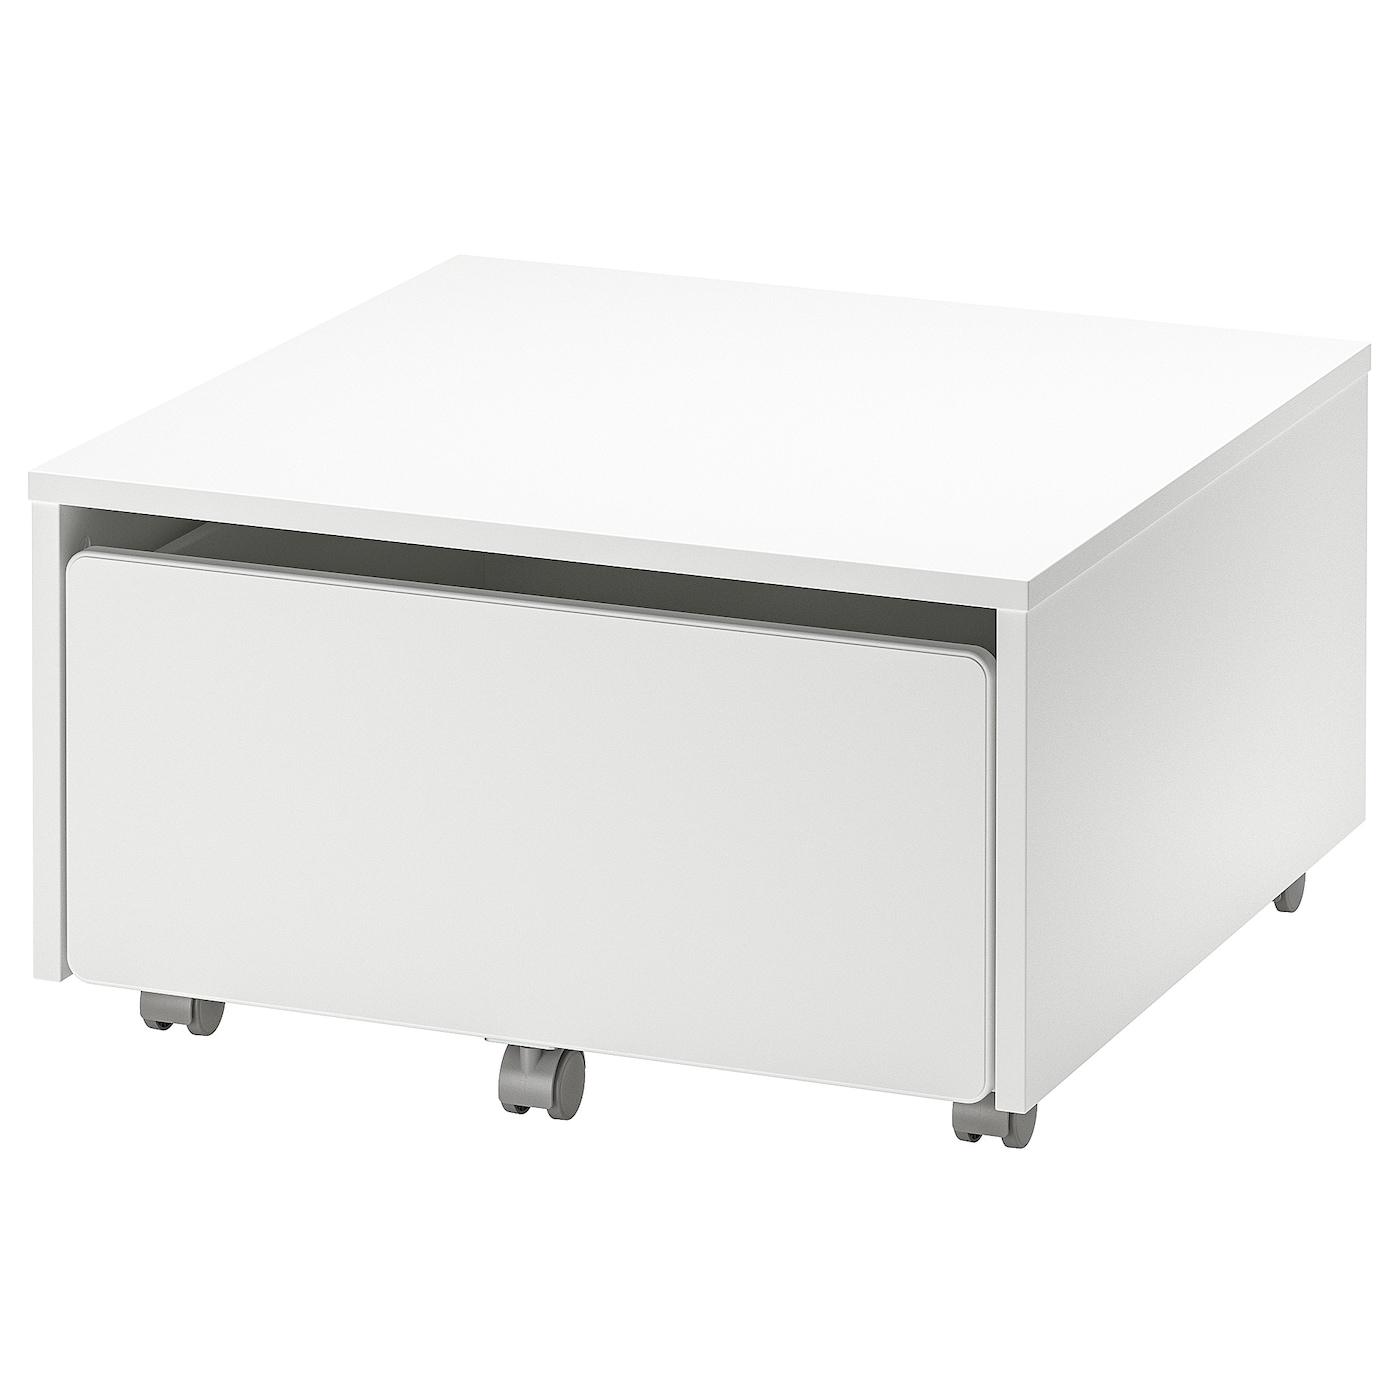 Colección Släkt Compra Online Ikea